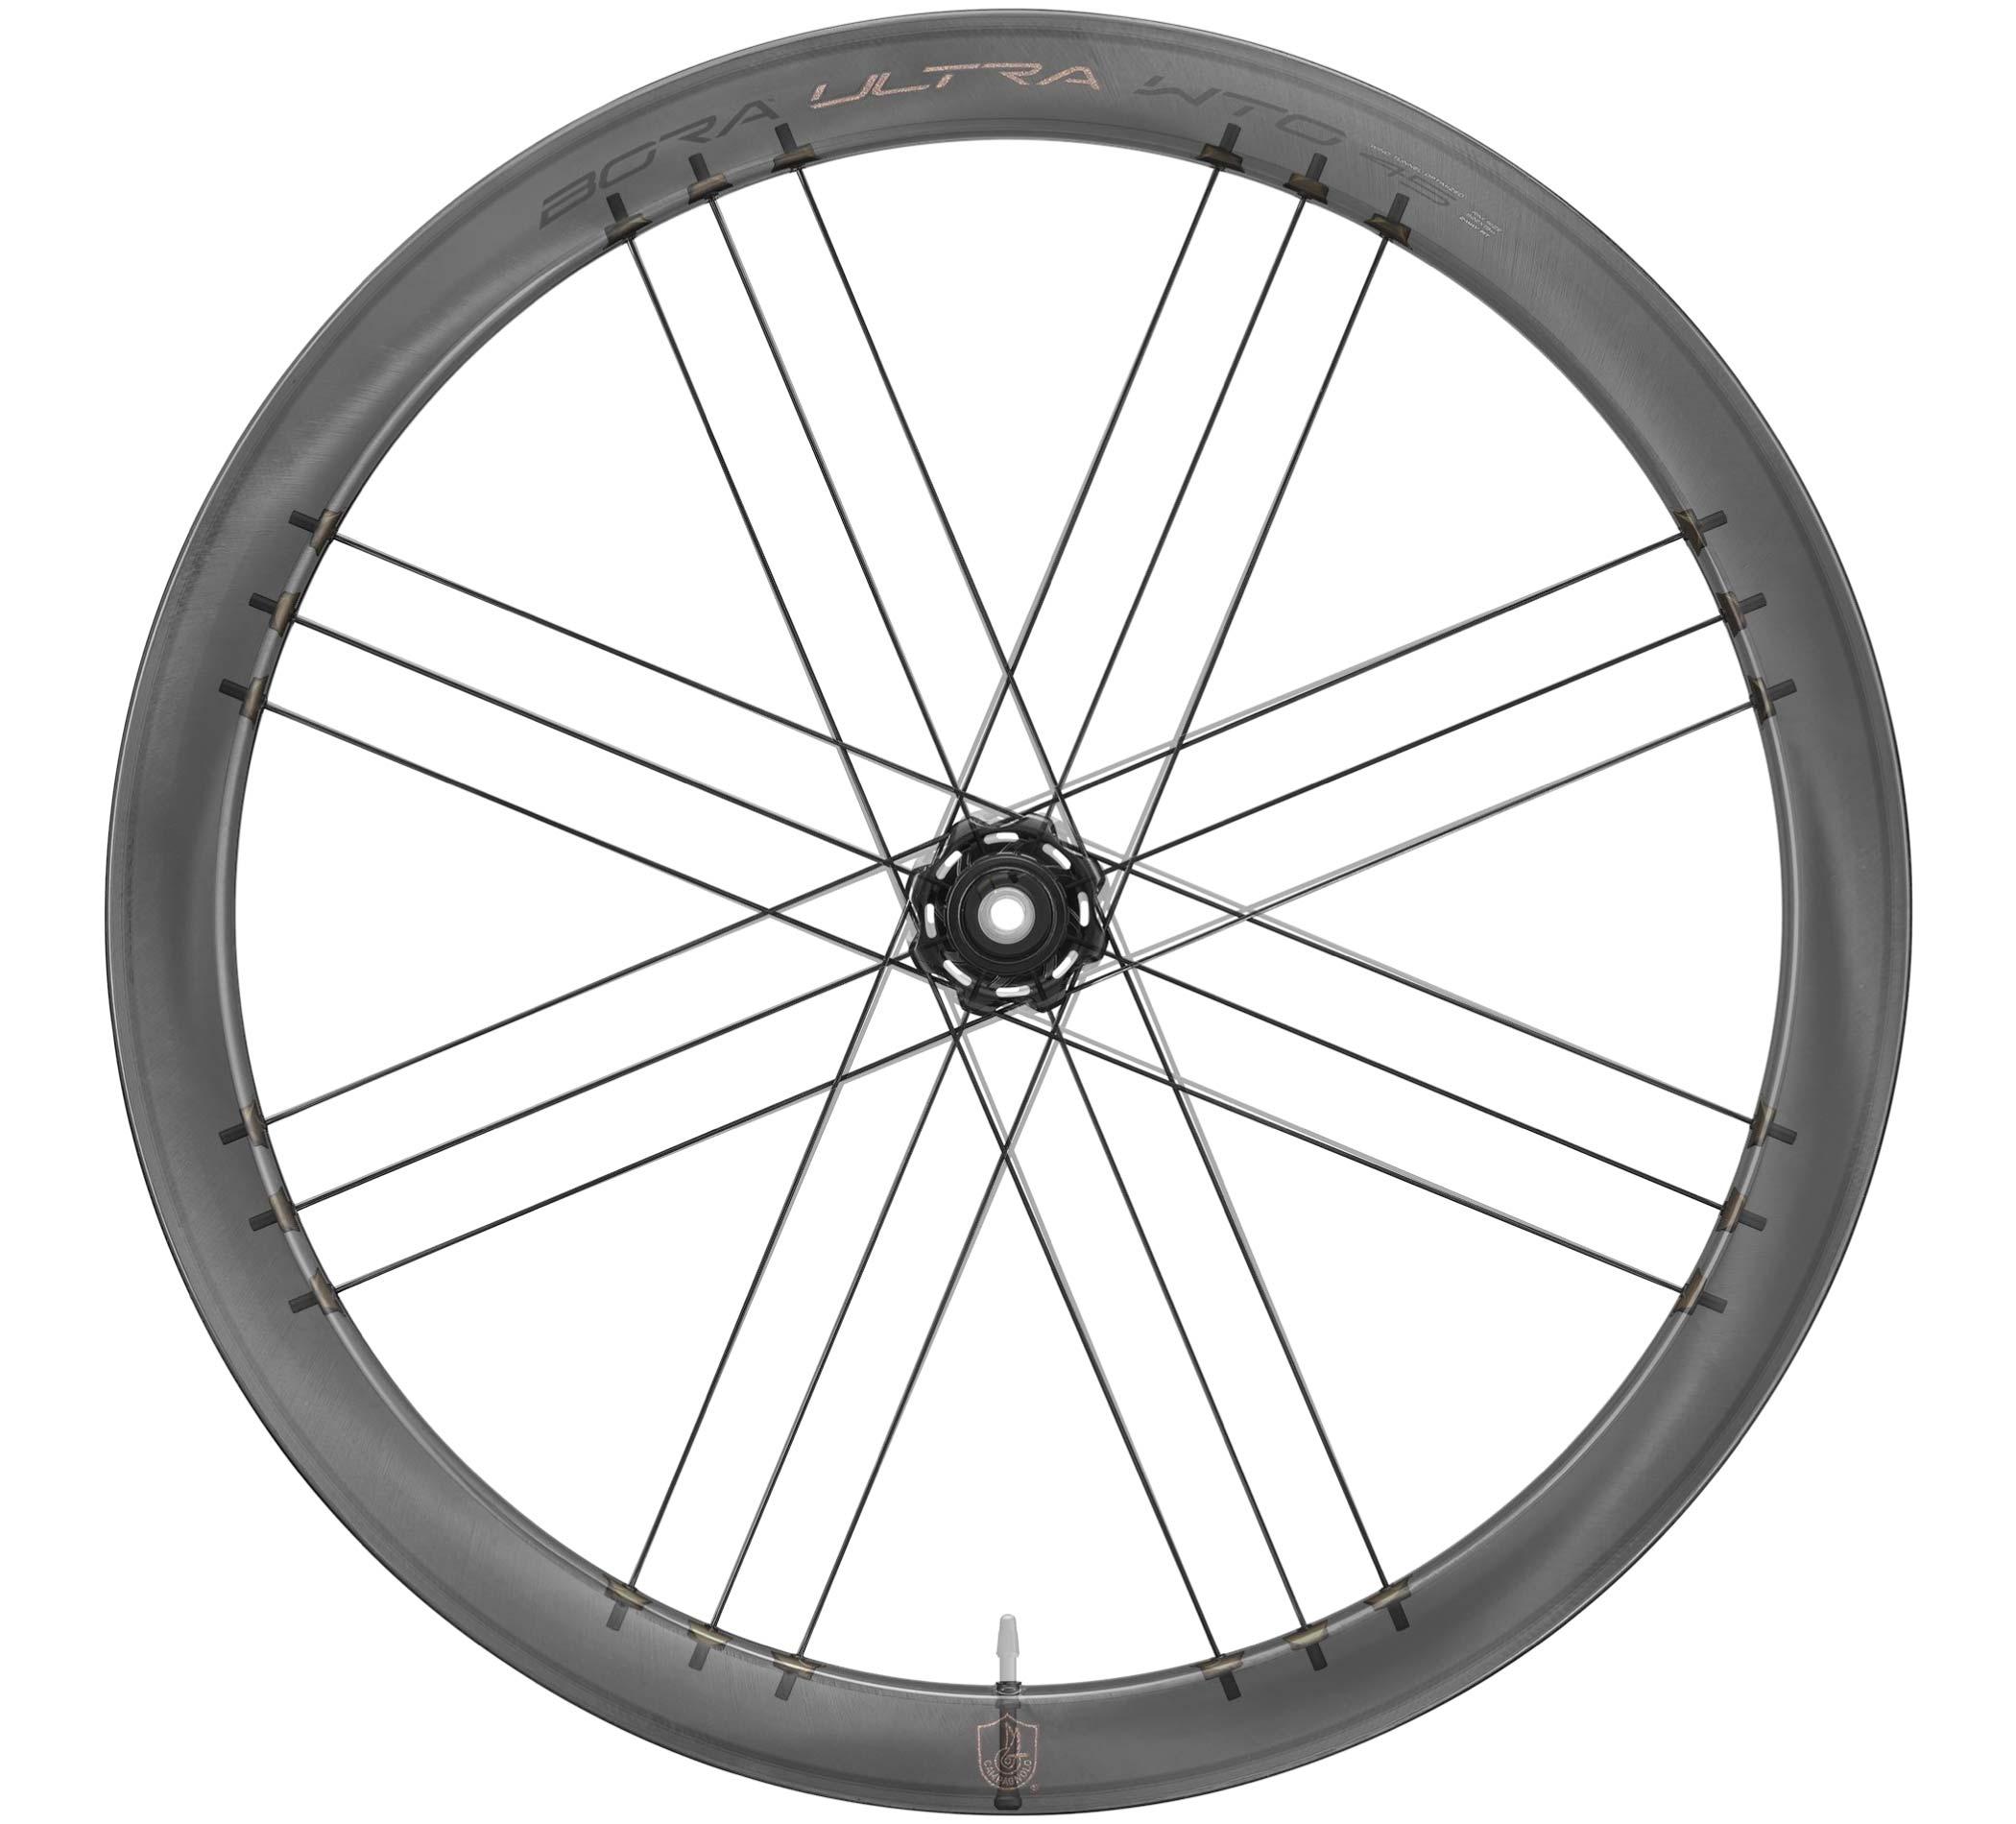 2021 Campagnolo Bora Ultra WTO aero carbon road bike wheelset, x-ray view internal nipples